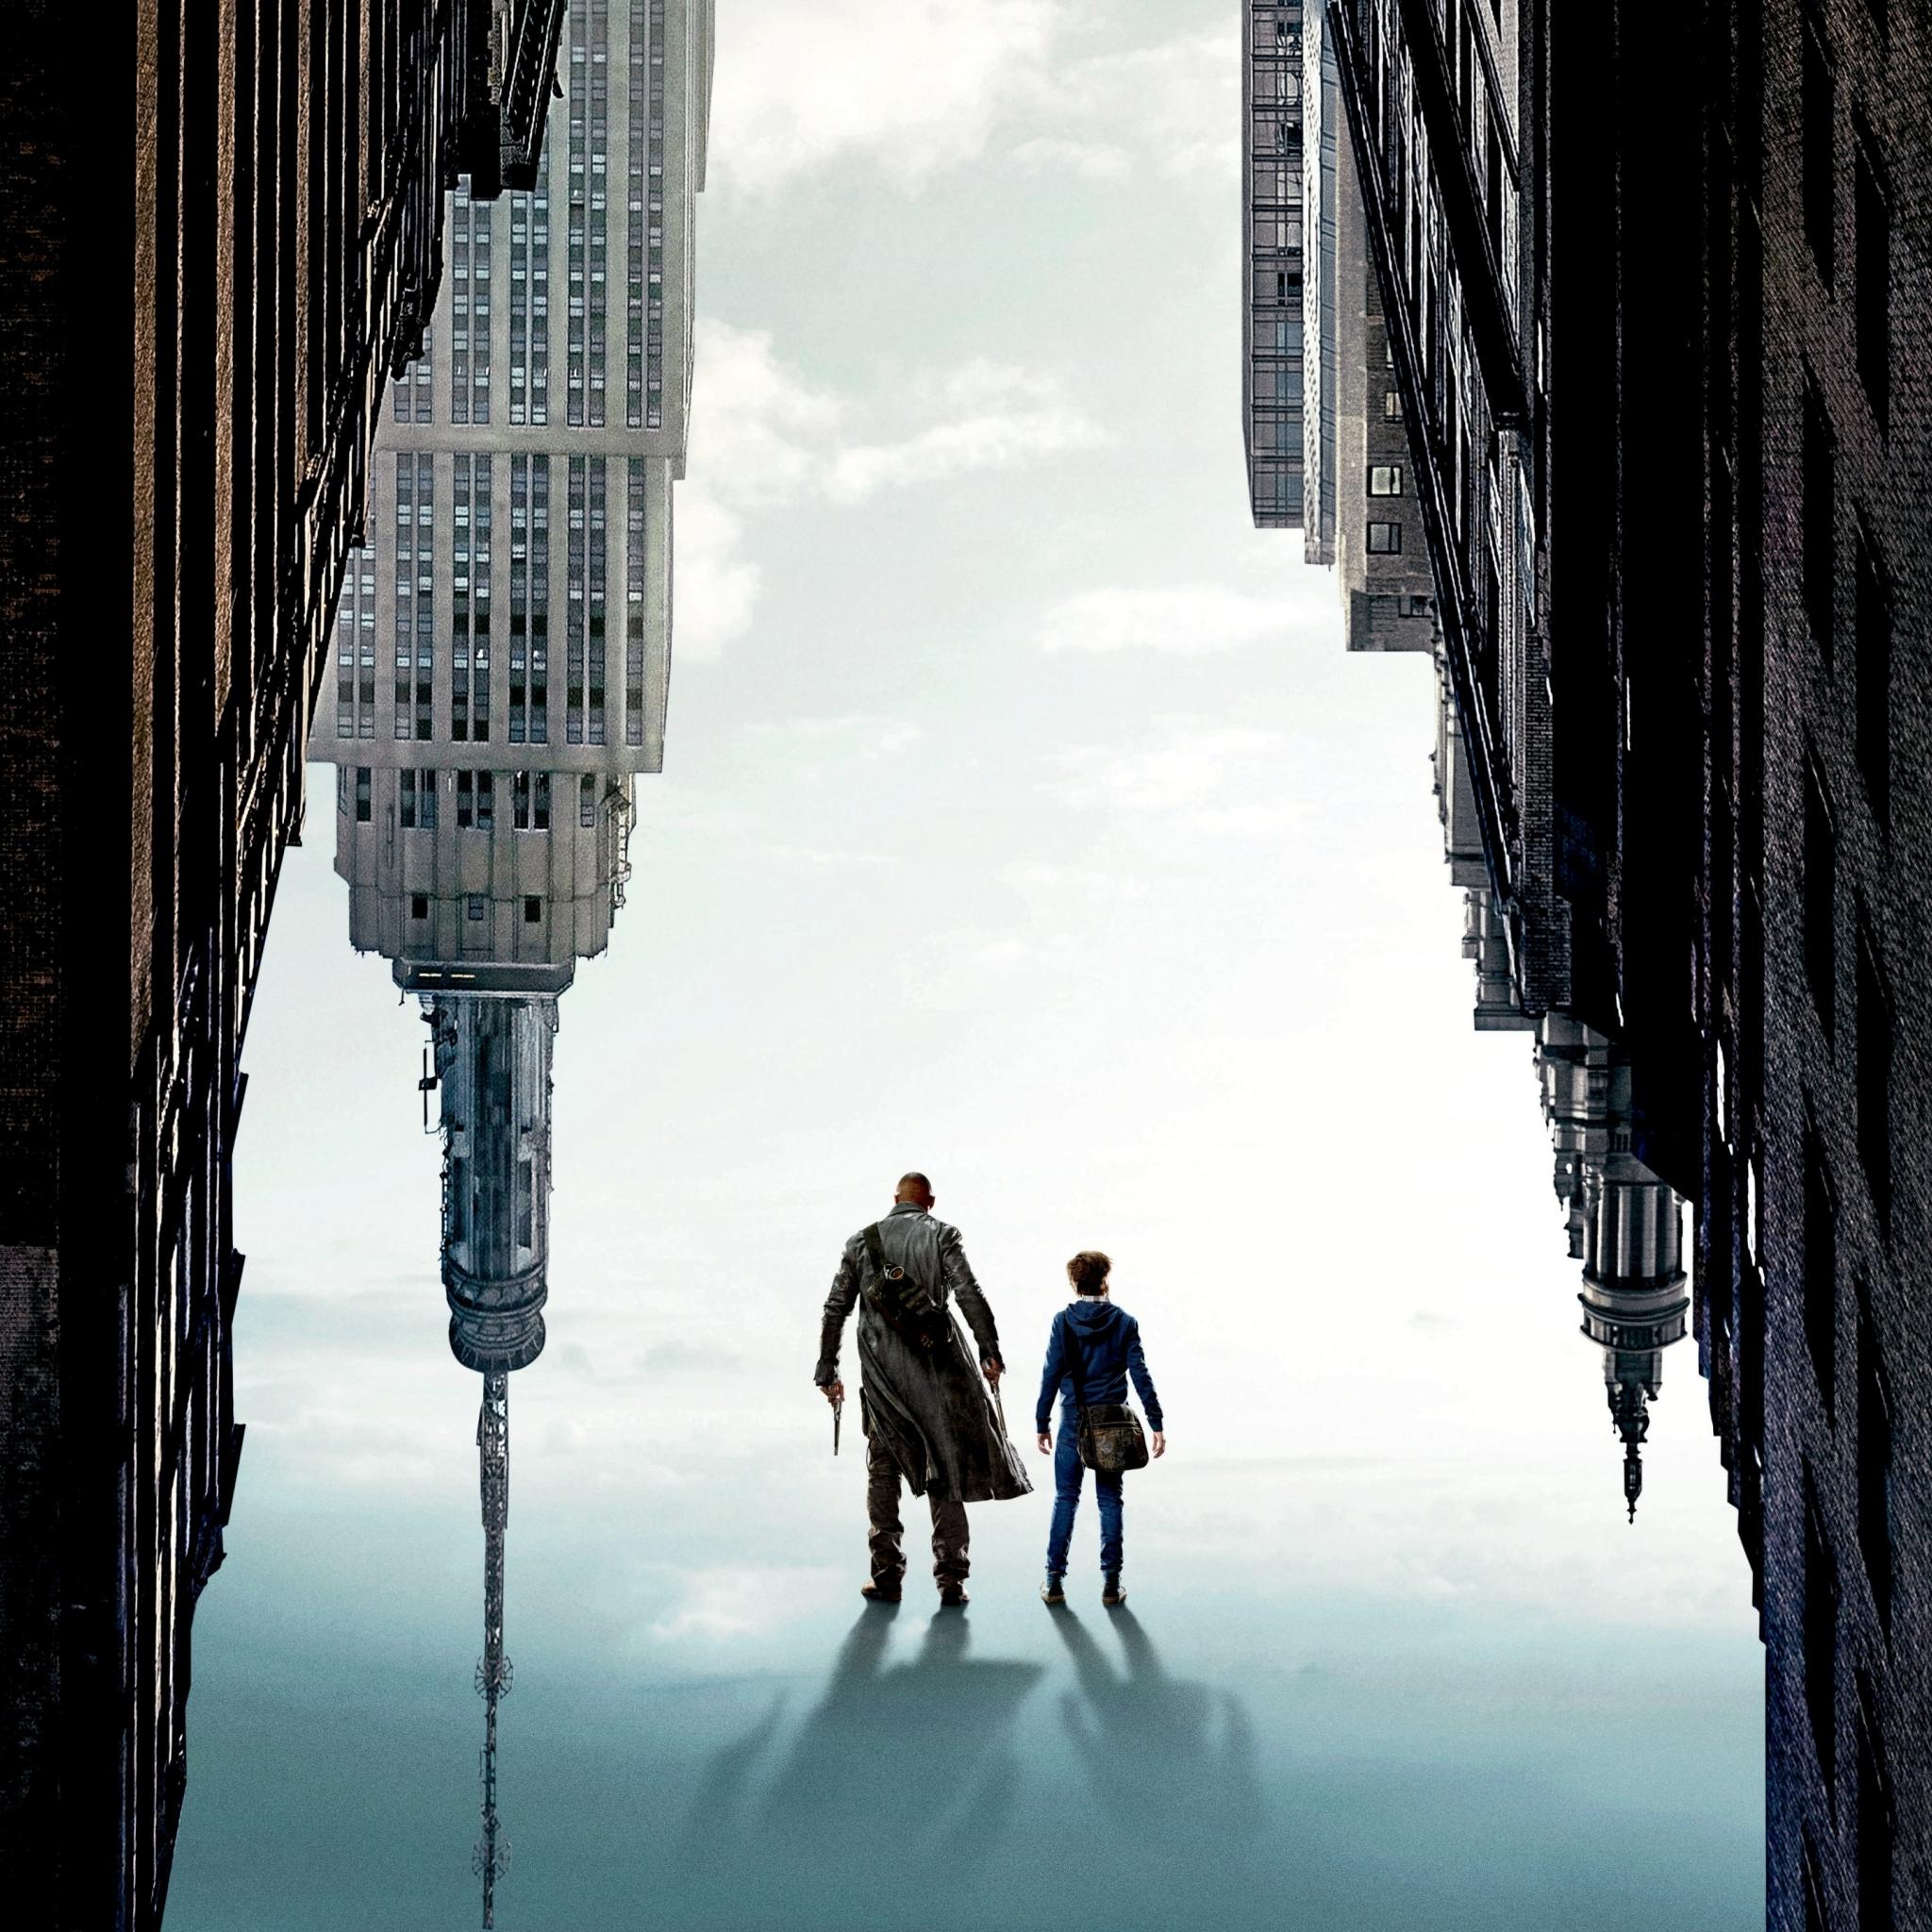 2048x2048 The Dark Tower Movie Still Ipad Air Wallpaper Hd Movies